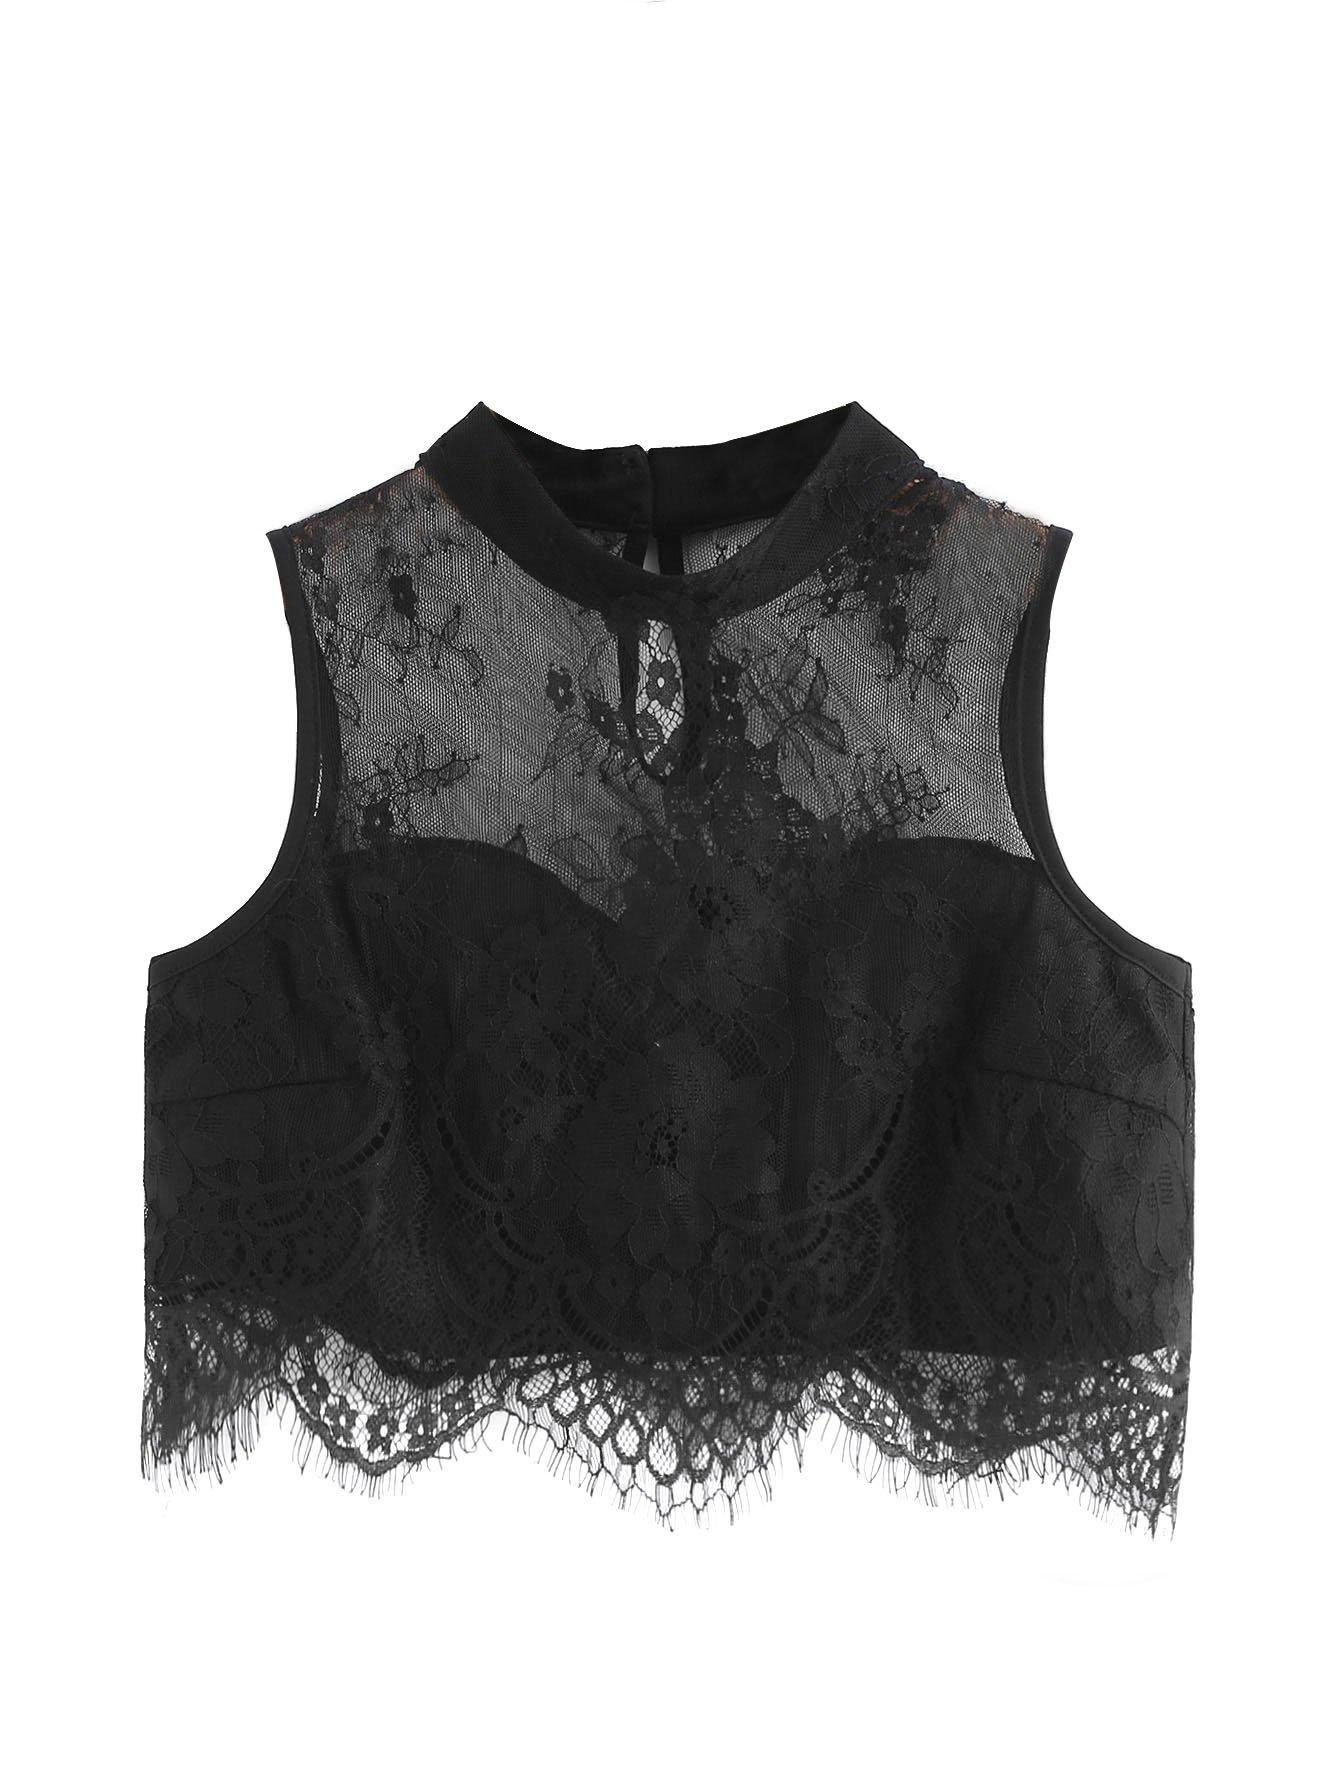 WDIRA Women's Floral Sheer Blouse Lace Sweetheart Sleeveless Crop Top Black L